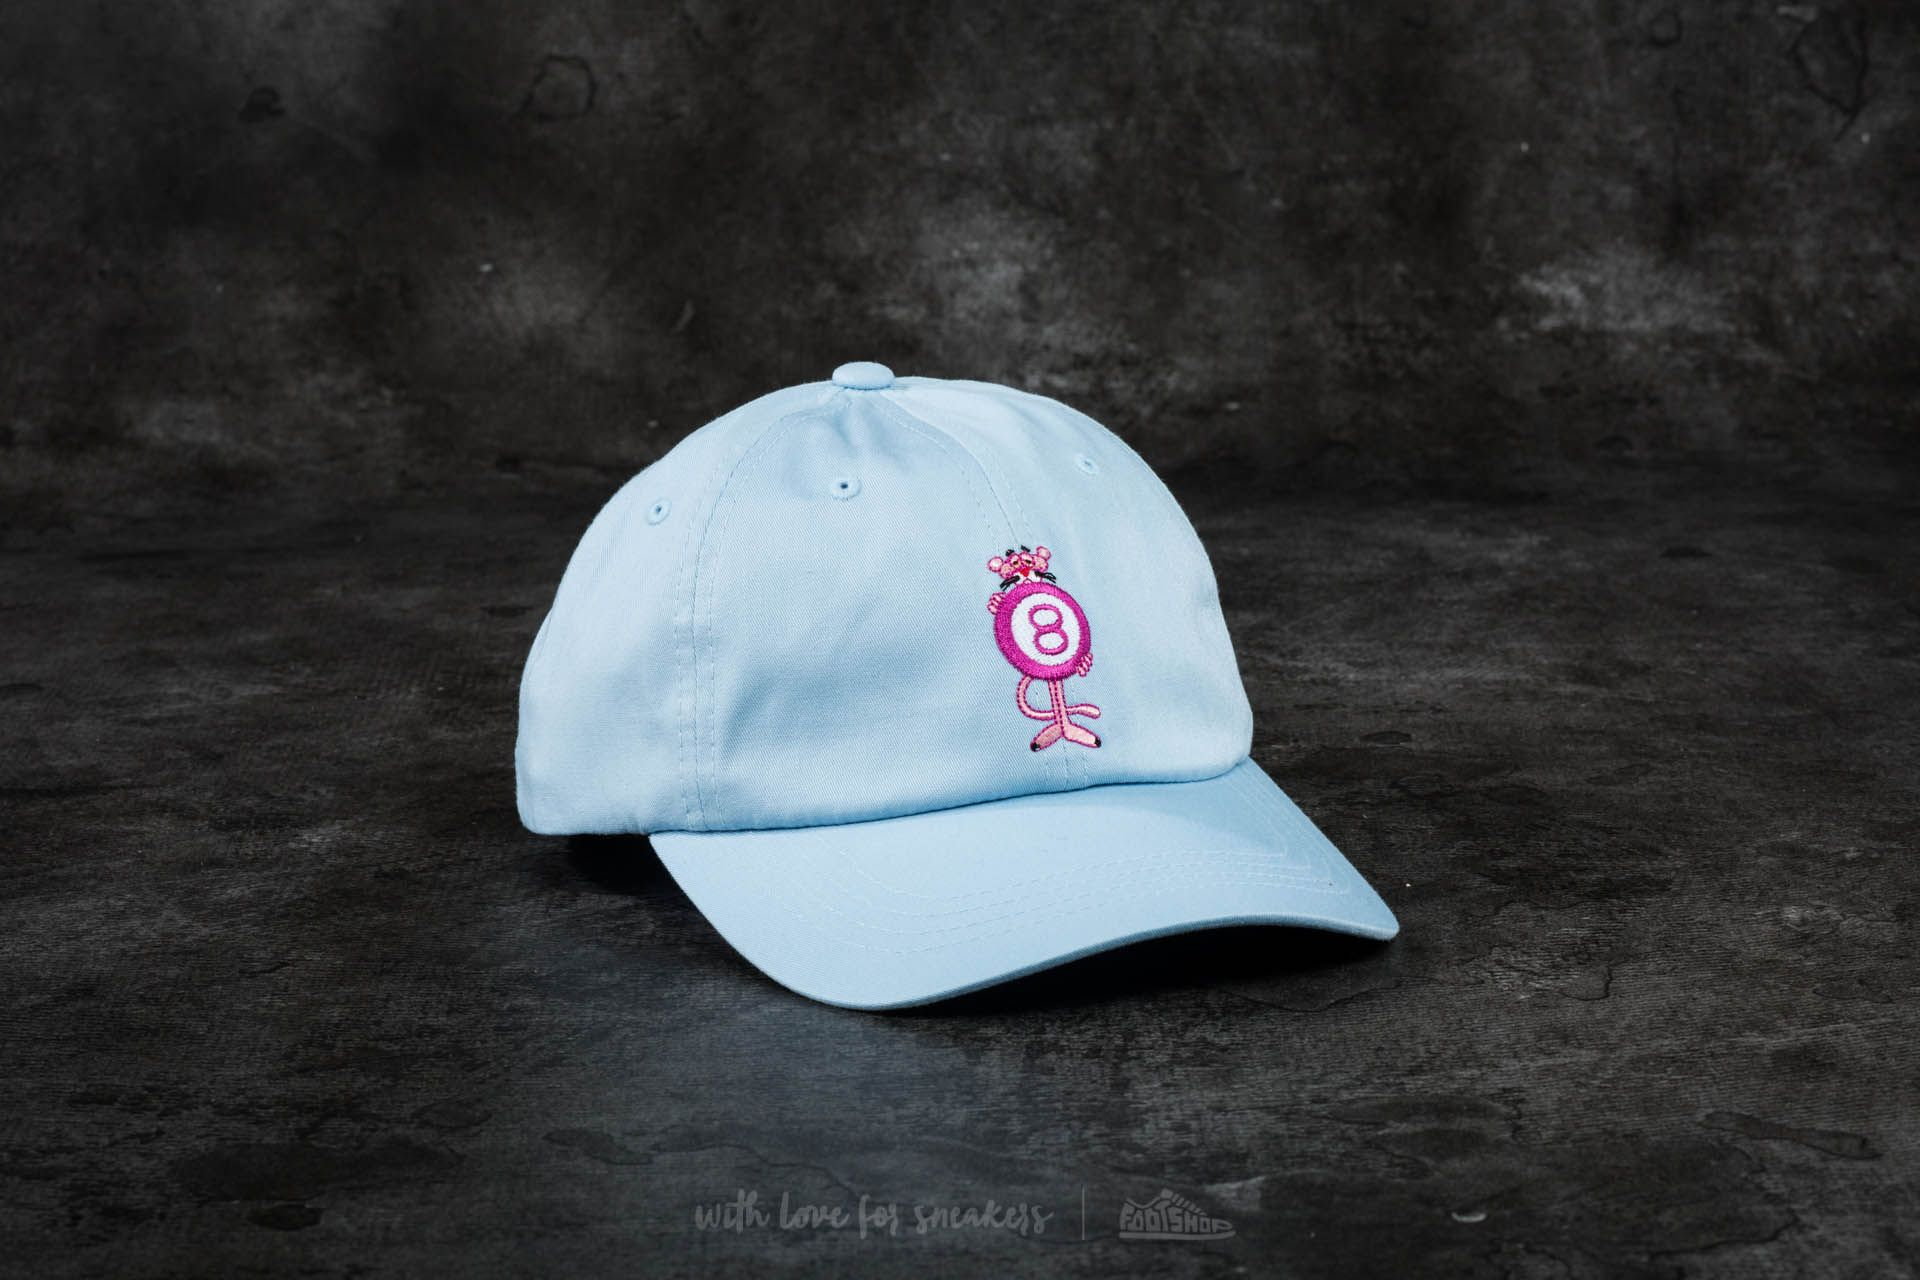 HUF x Pink Panther 8 Ball Dad Cap